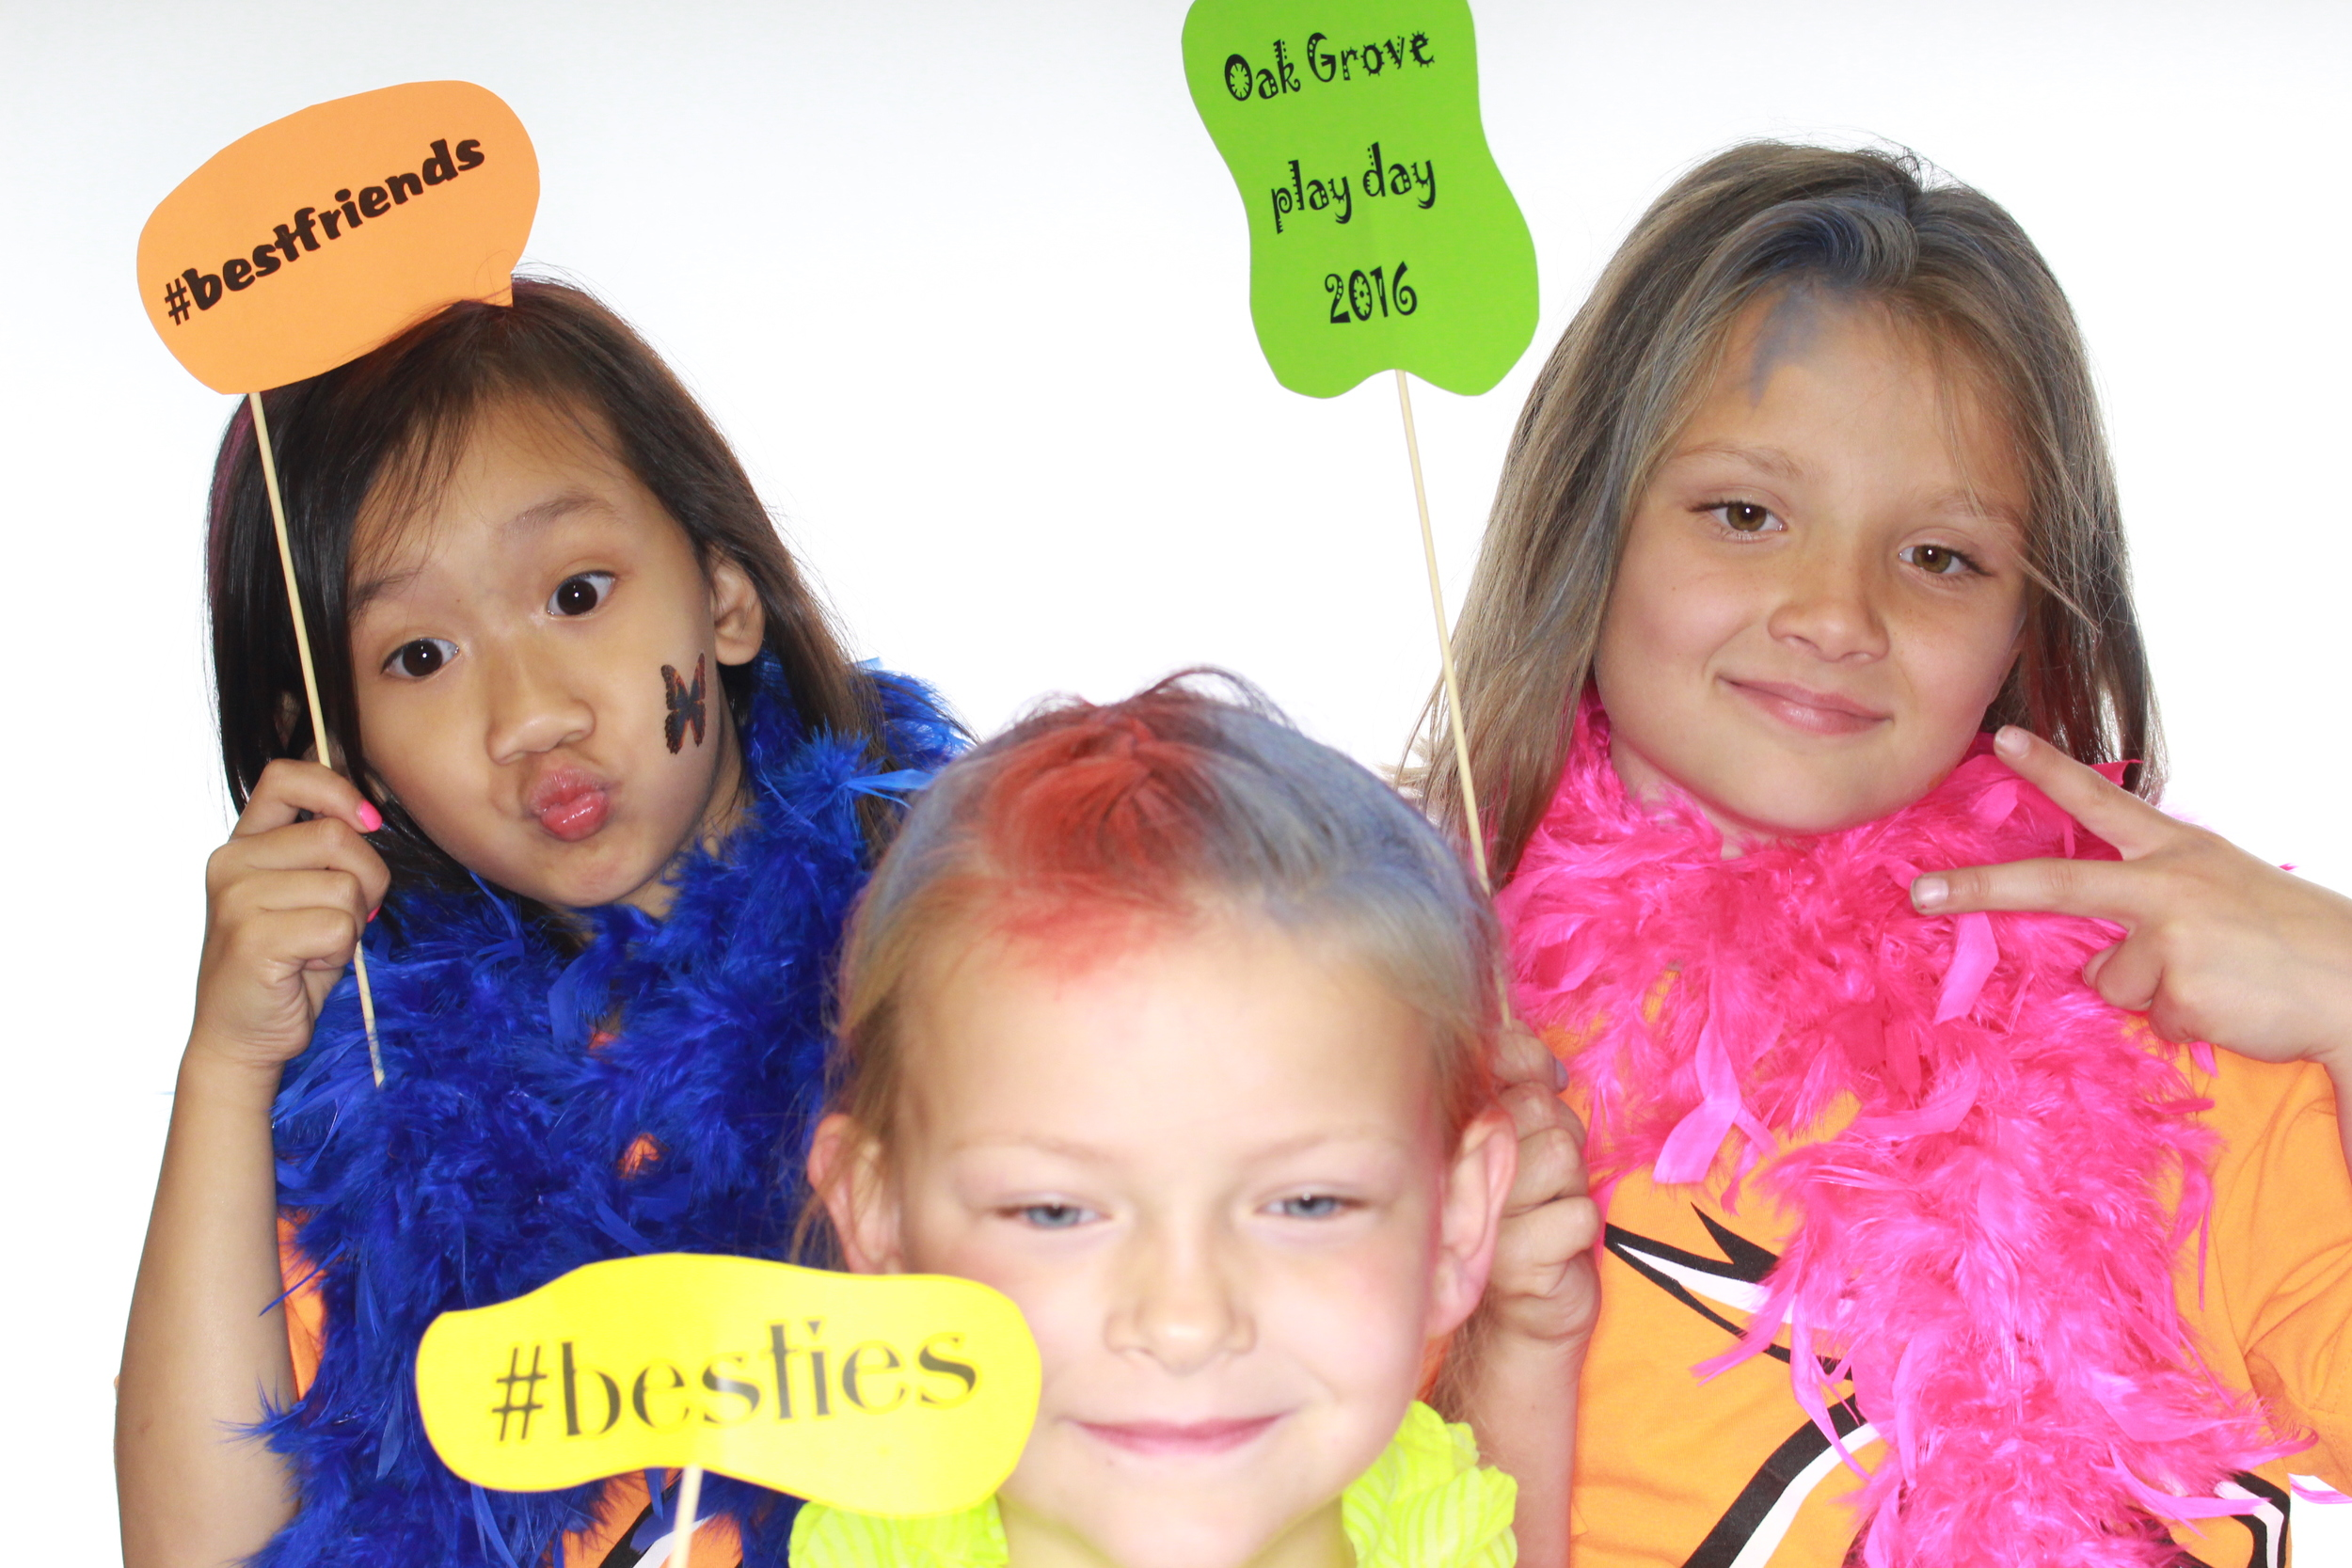 Oak Grove Elementary Play Day - 1st Grade